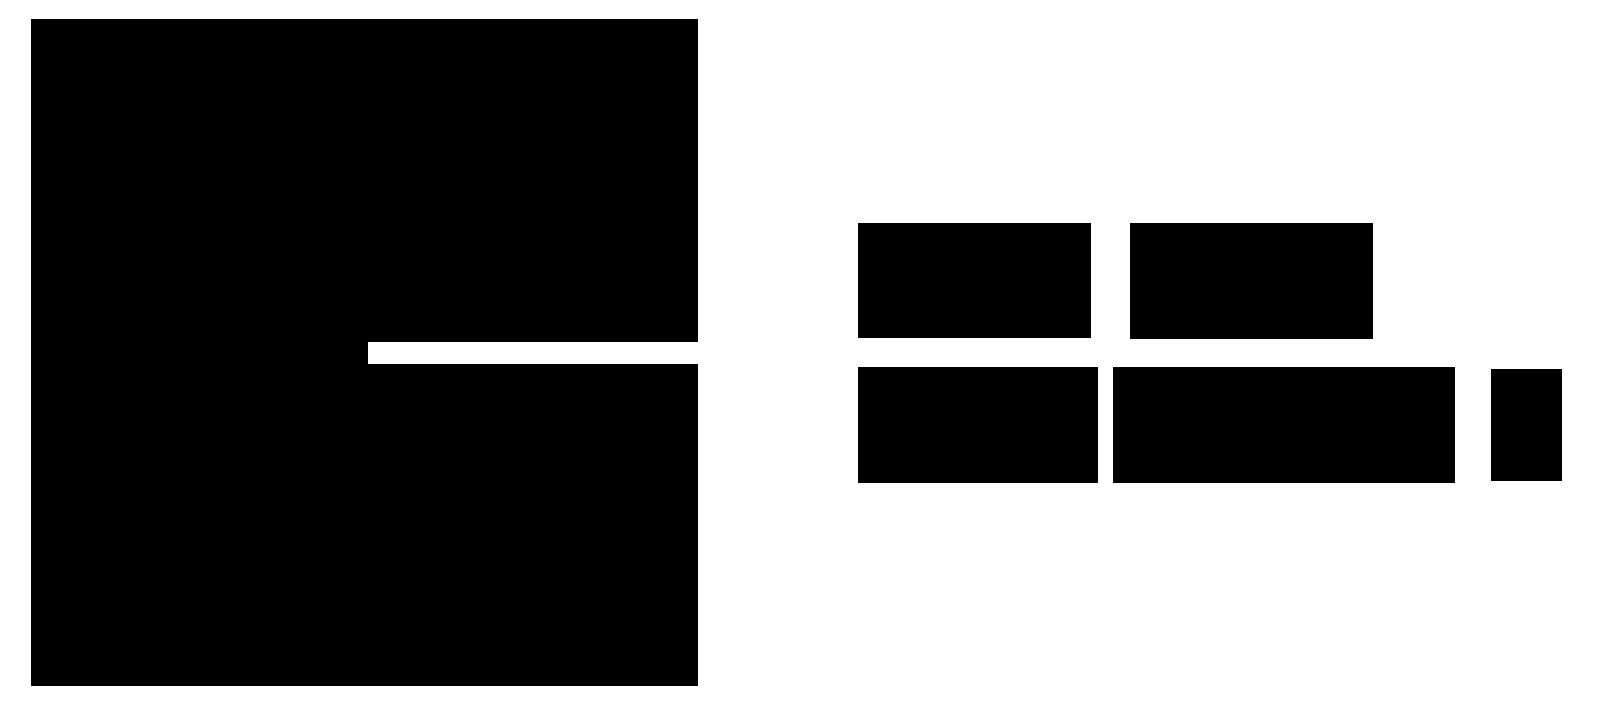 slingstone-logo-1600-1_BW.png